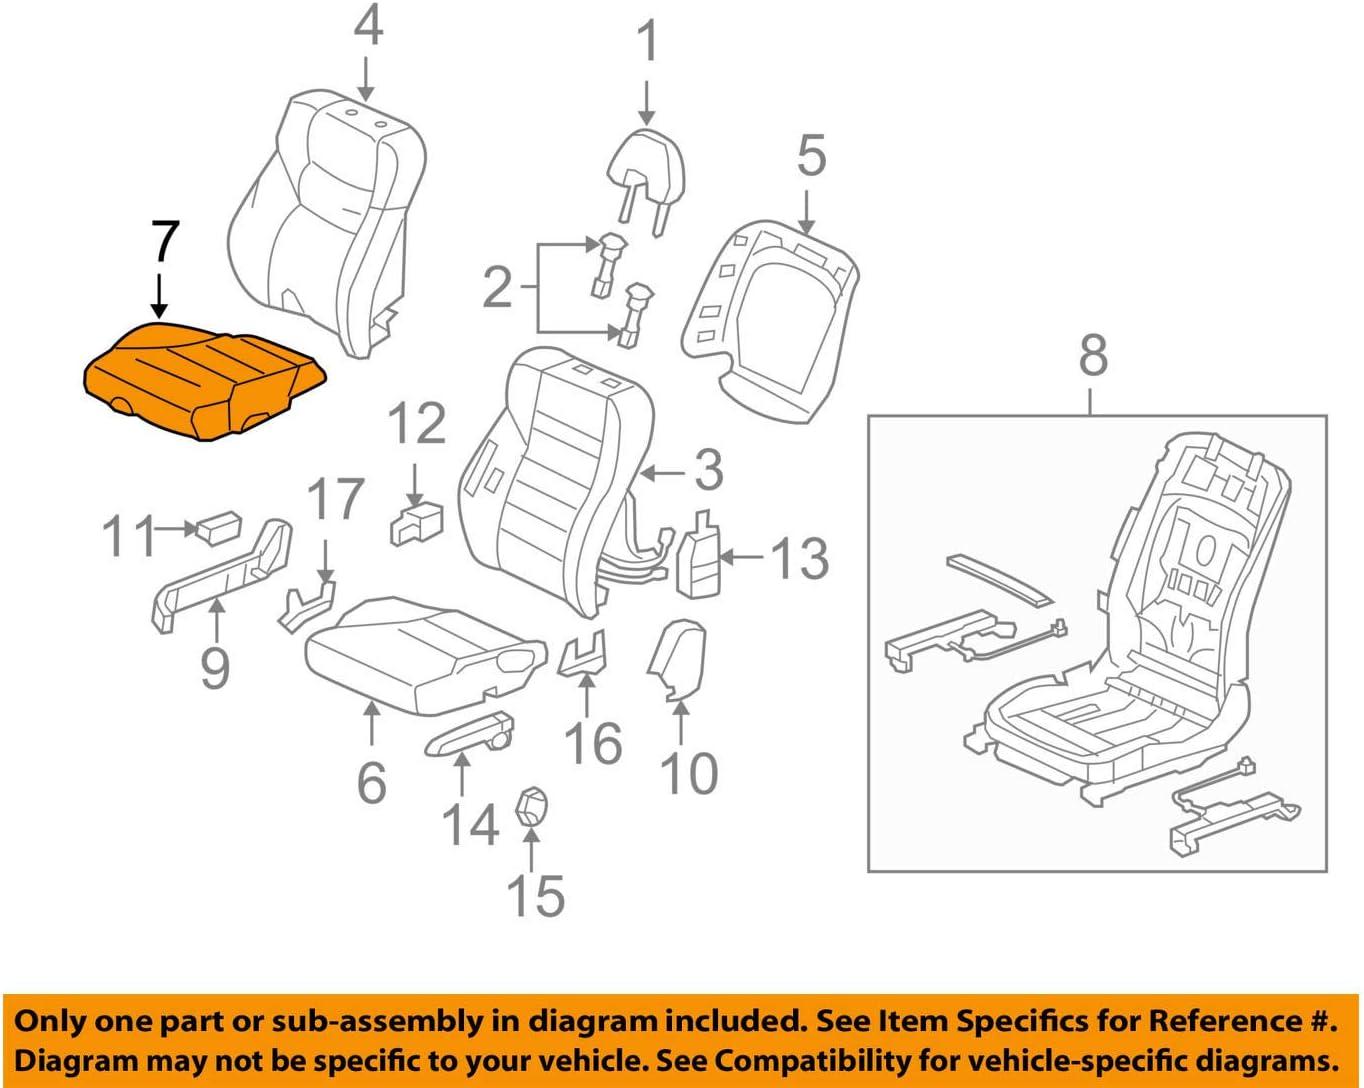 TOYOTA Genuine 71072-06051-K3 Seat Cushion Cover